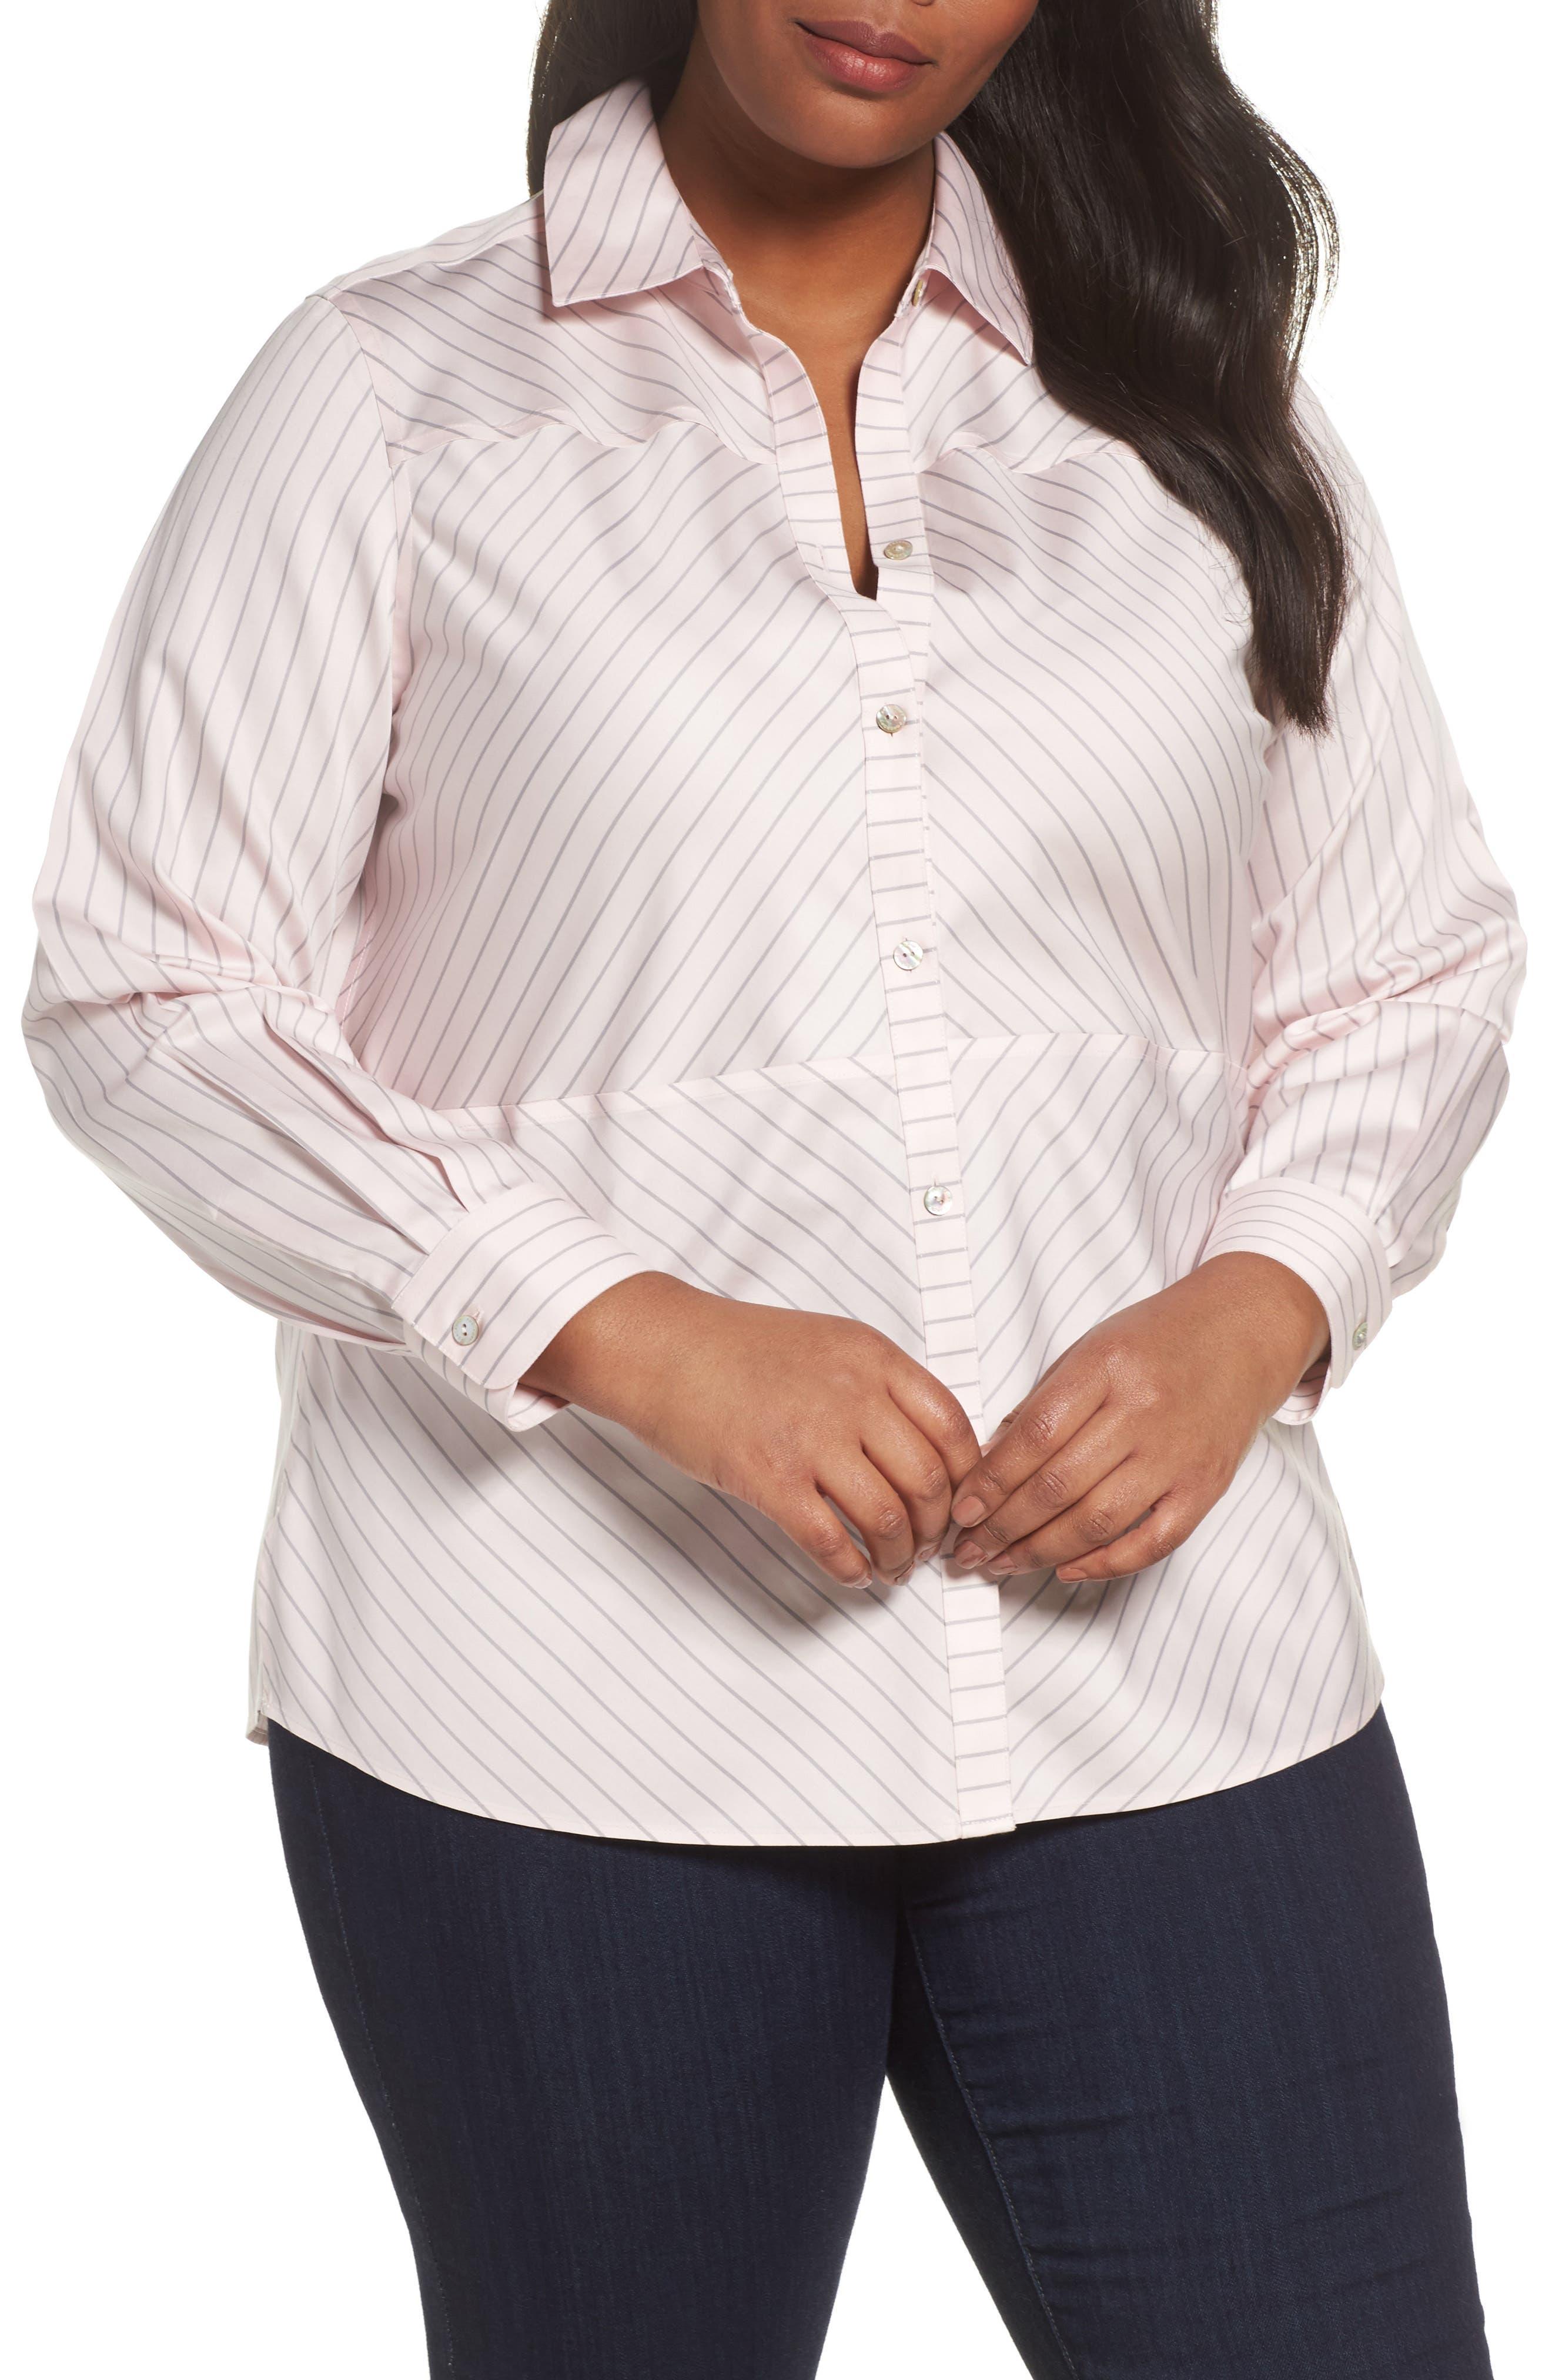 Monica Classic Stripe Shirt,                             Main thumbnail 1, color,                             Blush